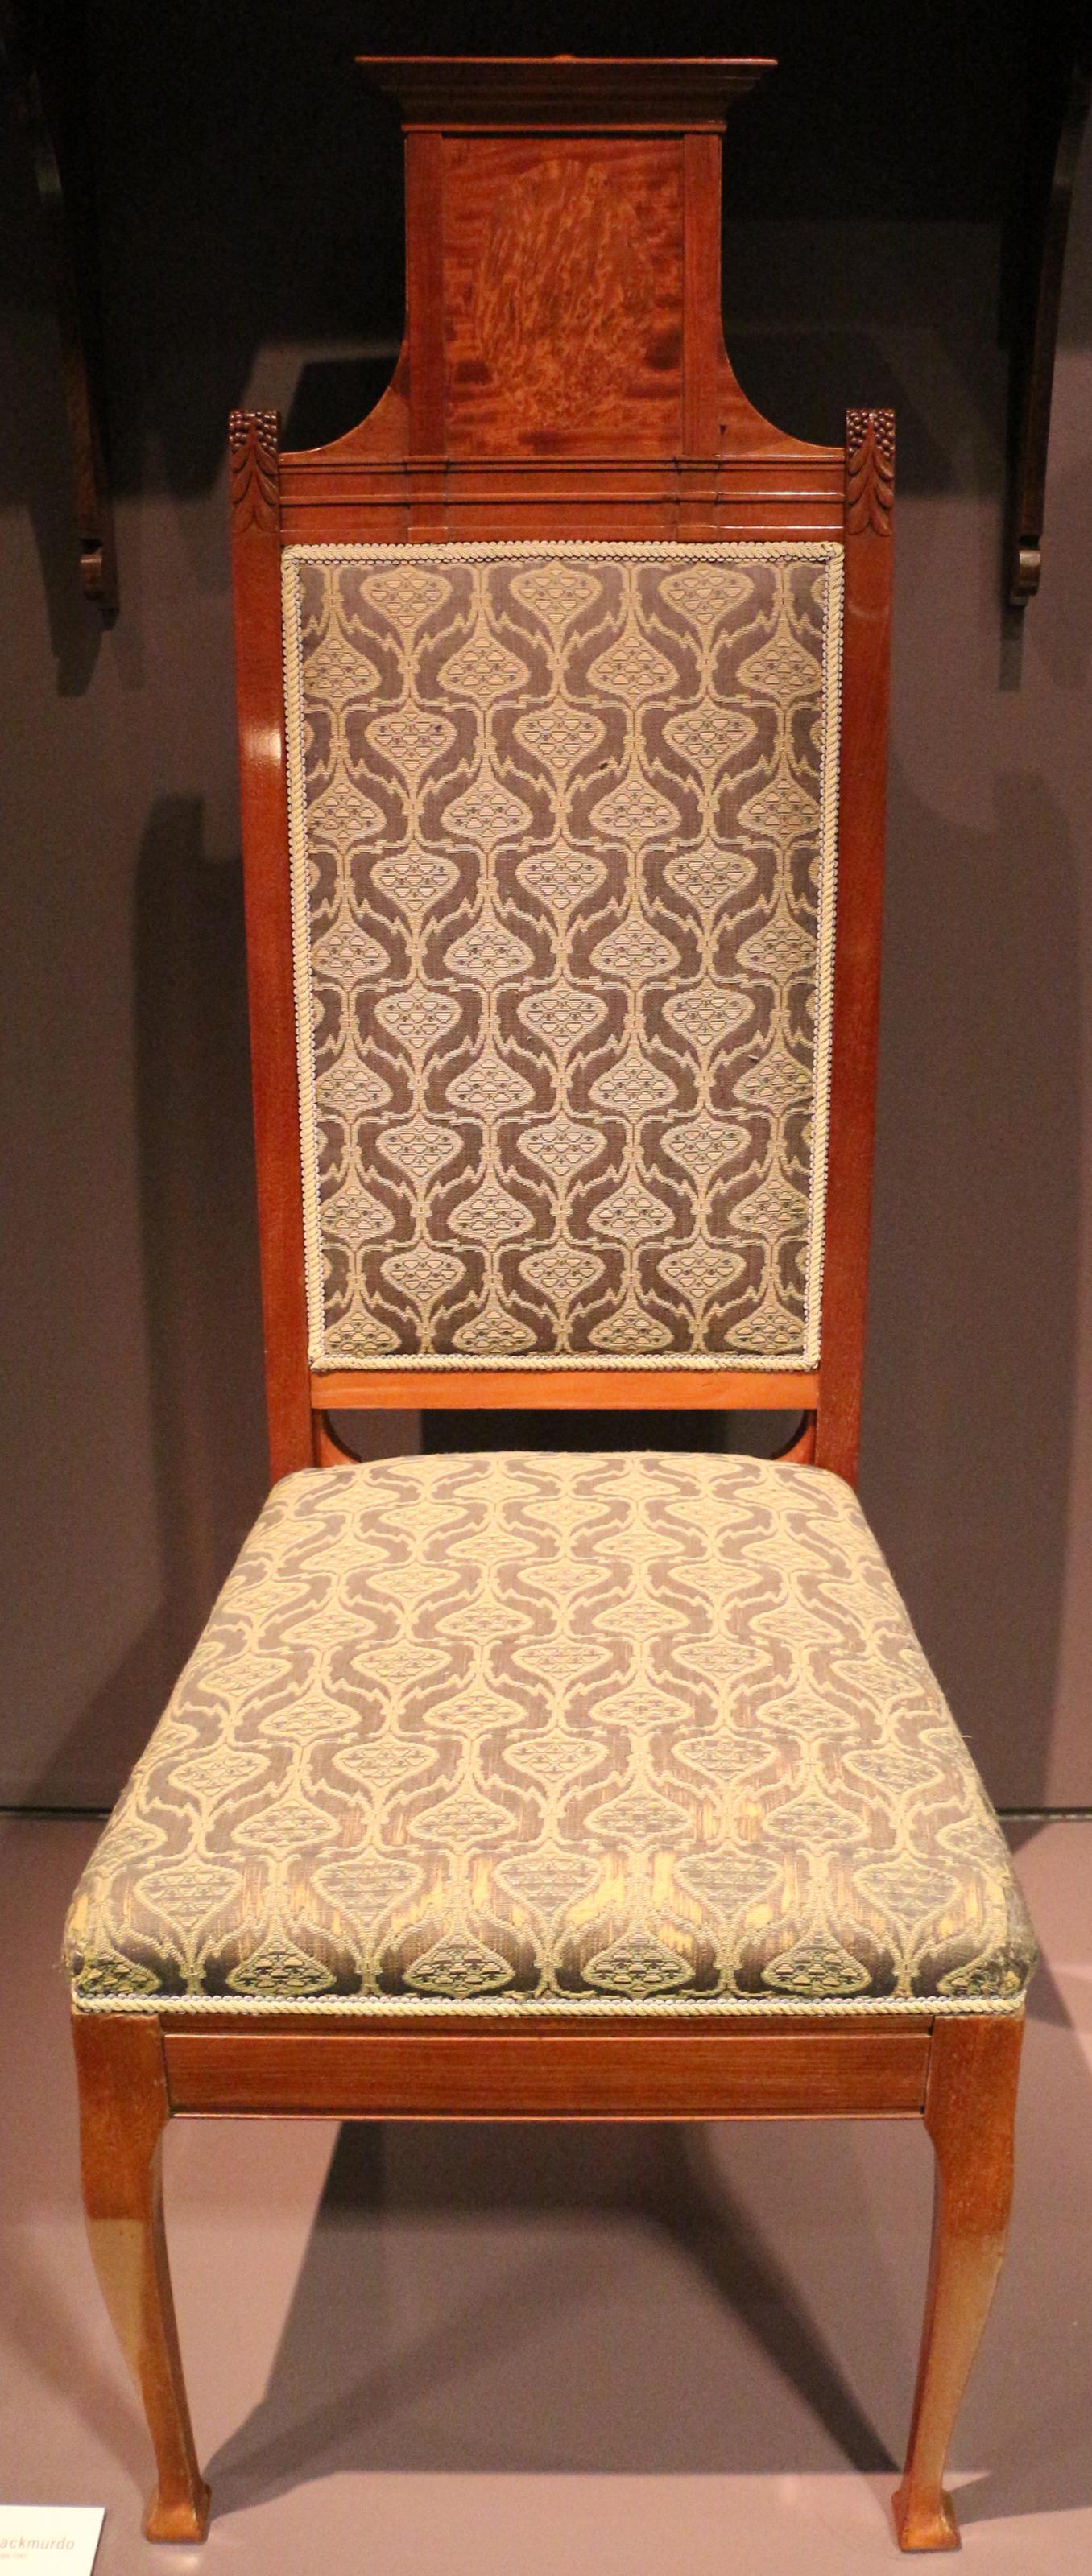 File e goodall co arthur heygate mackmurdo sedia - Sedia da pranzo ...